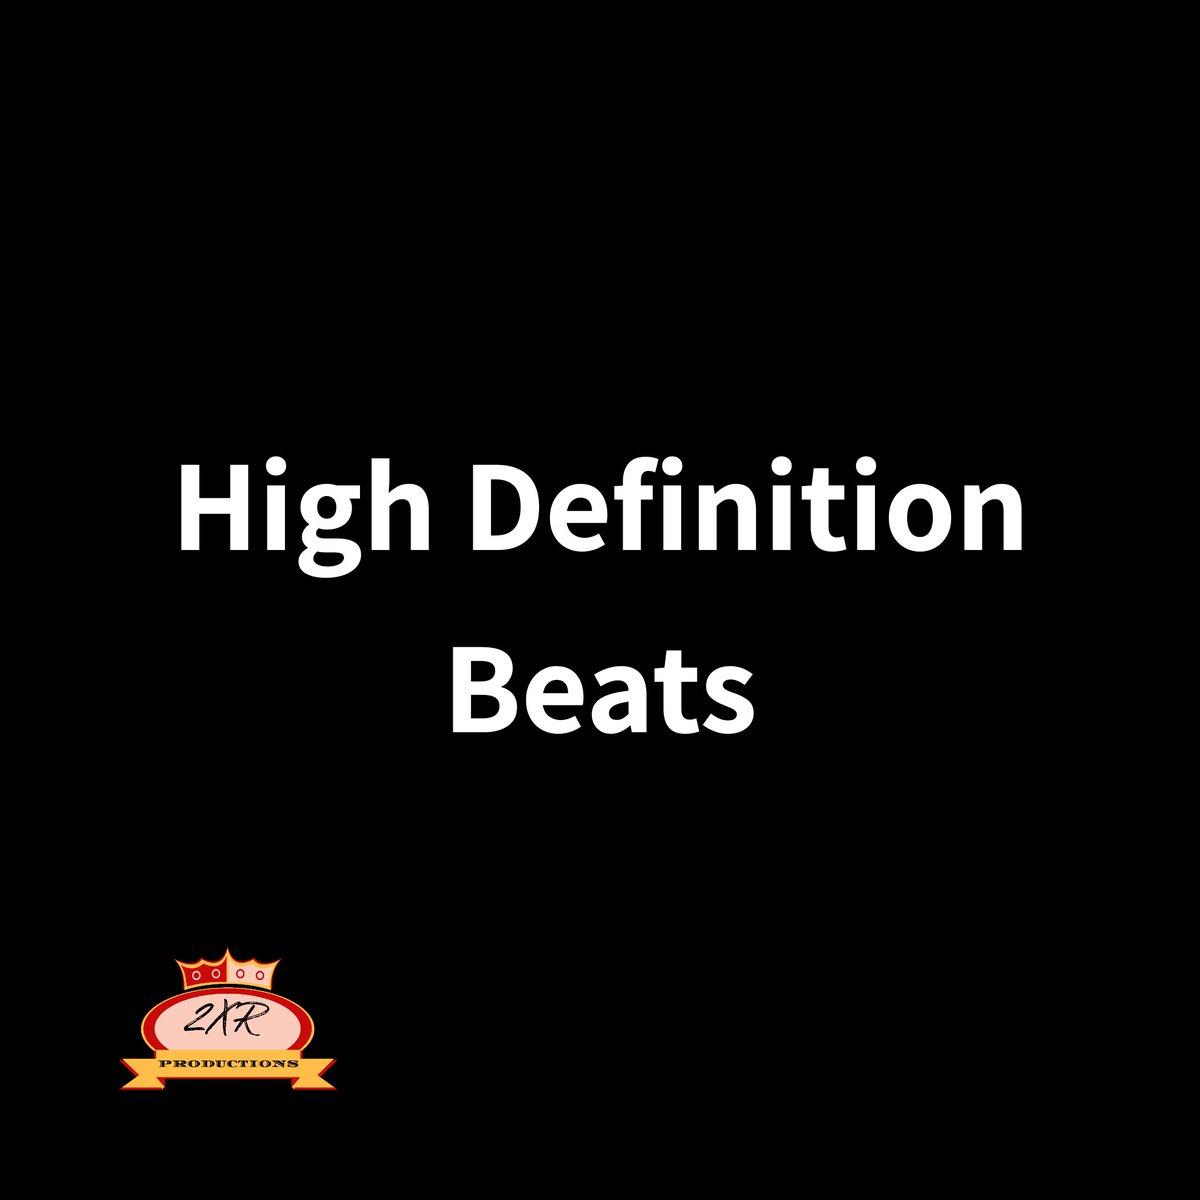 #musicstudio #ableton #songwriter #studiolife #artist #dj #musicproducers #musicians #beatmaking